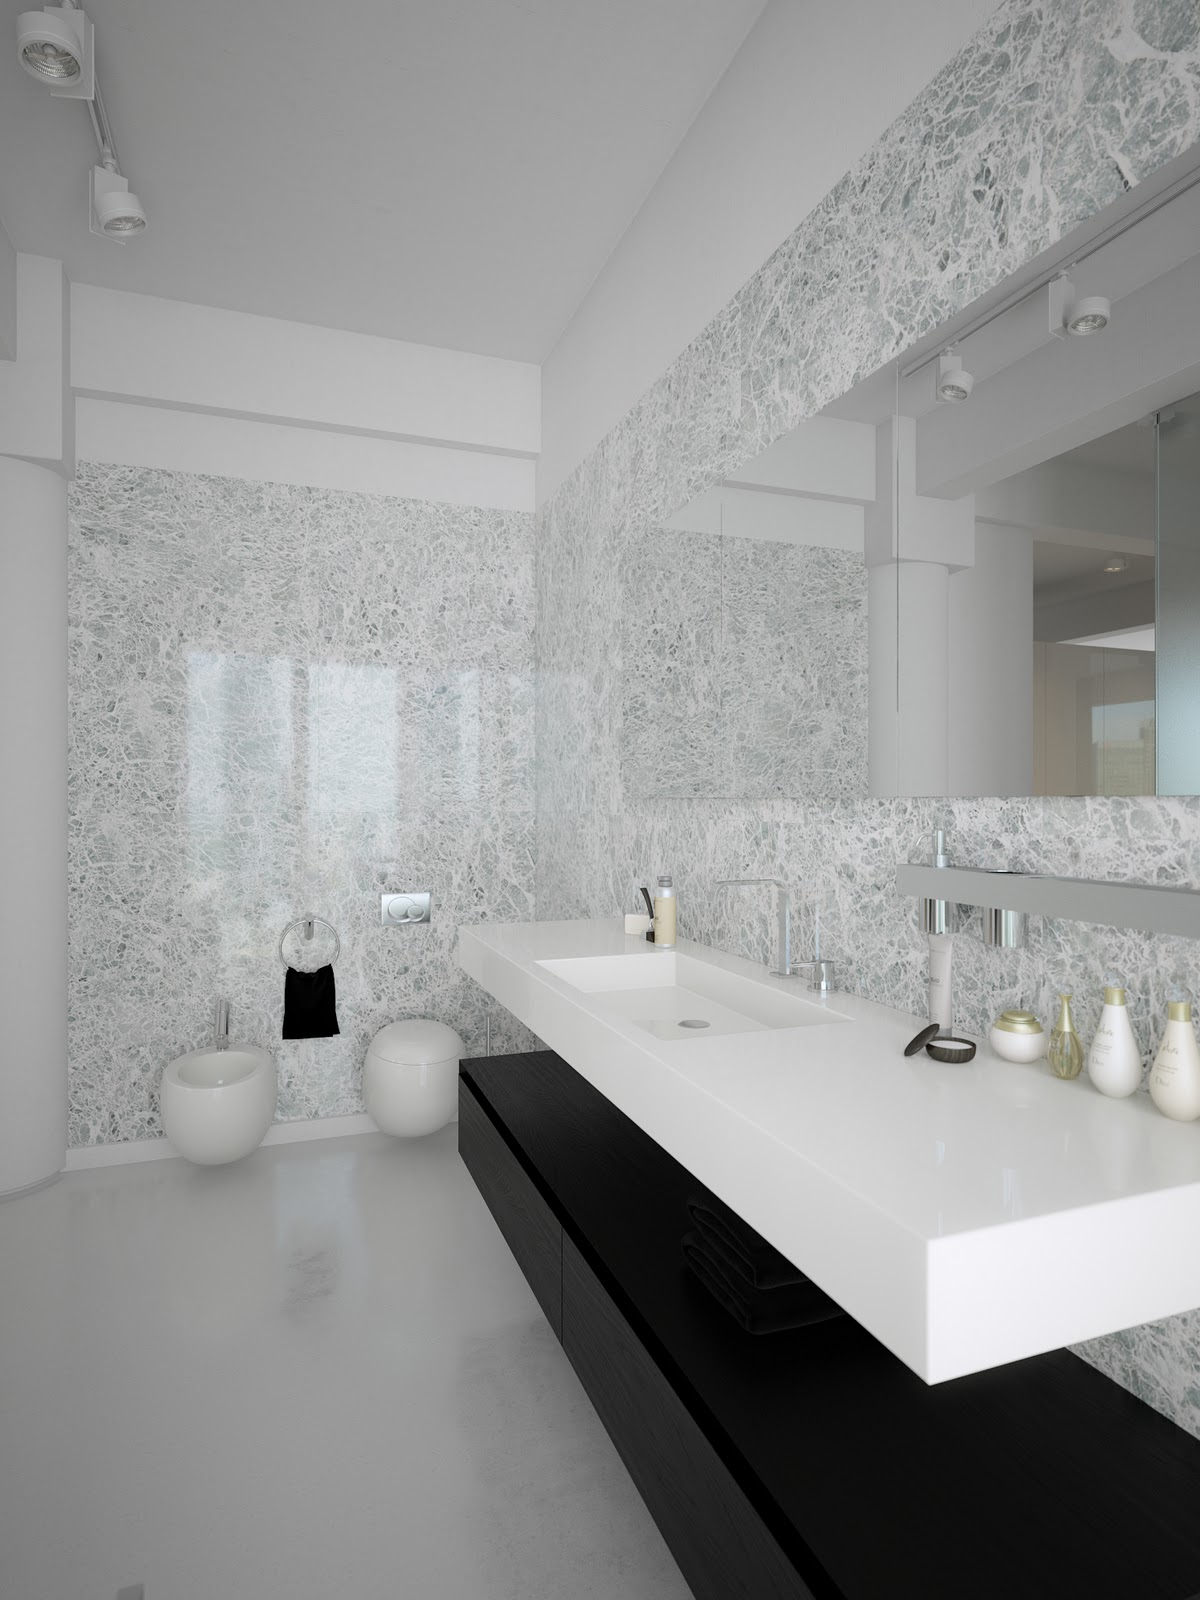 Trendy Bathroom Design Ideas Combined With White Color ... on White Bathroom Design Ideas  id=66308